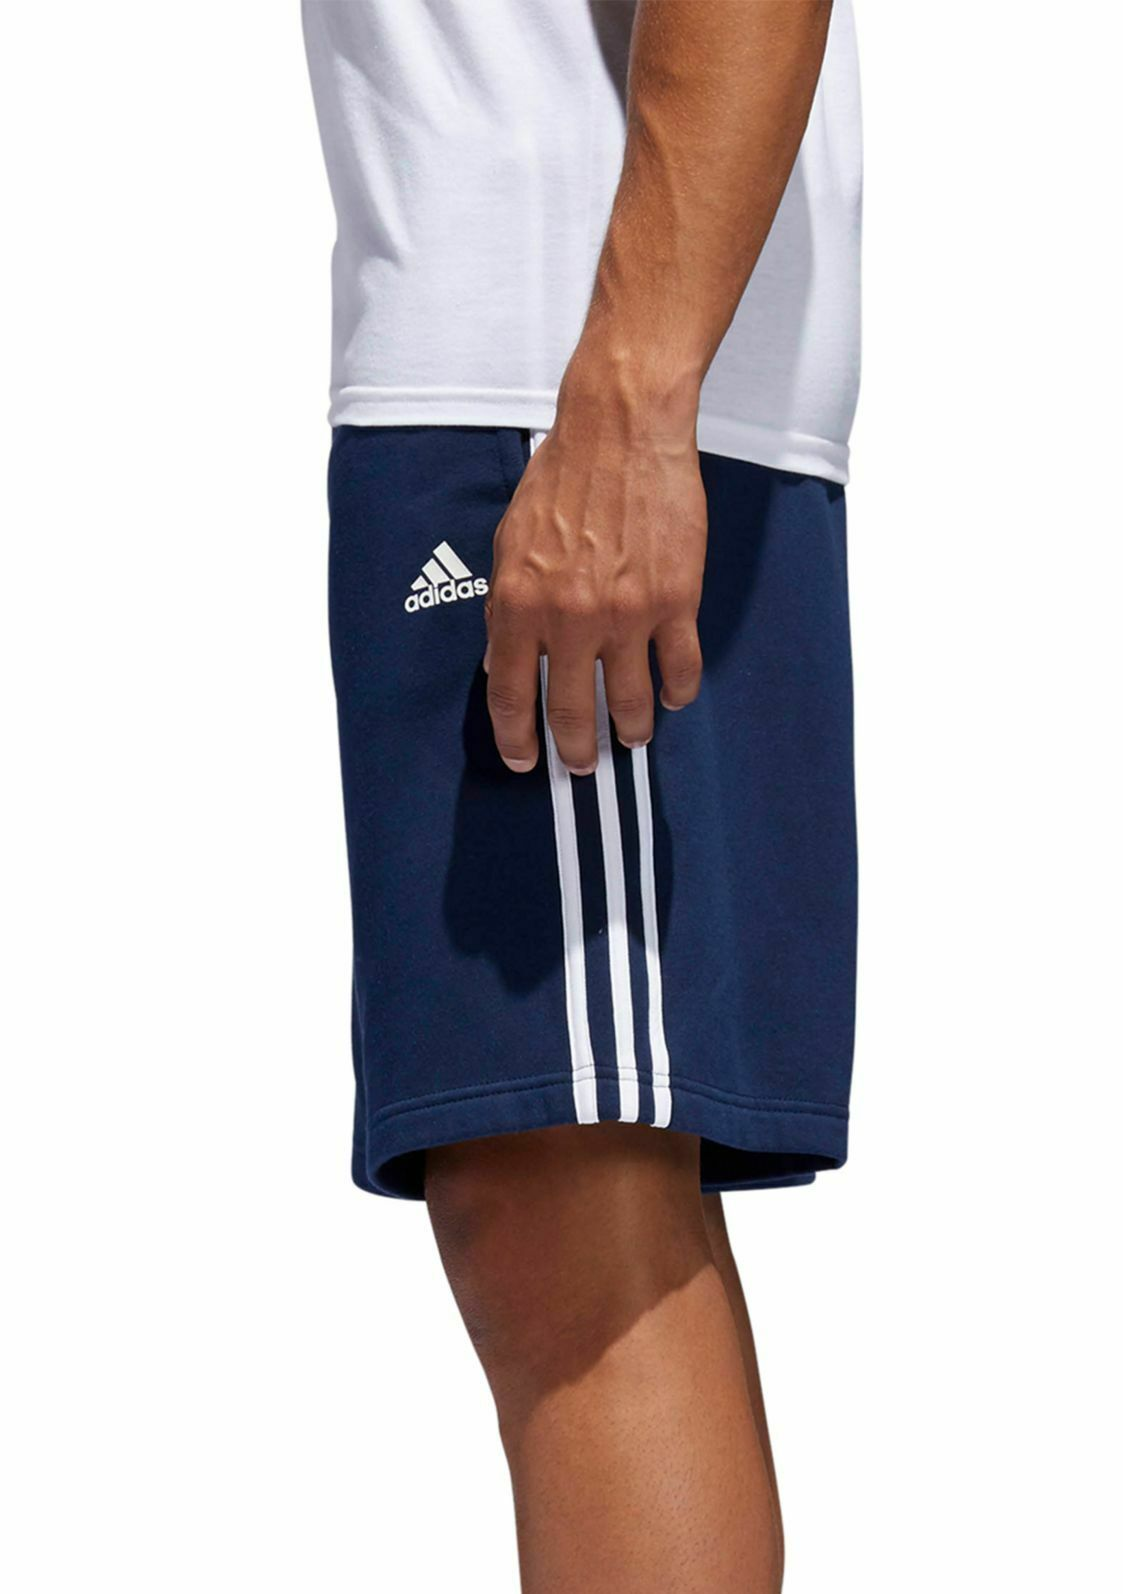 adidas navy fleece shorts